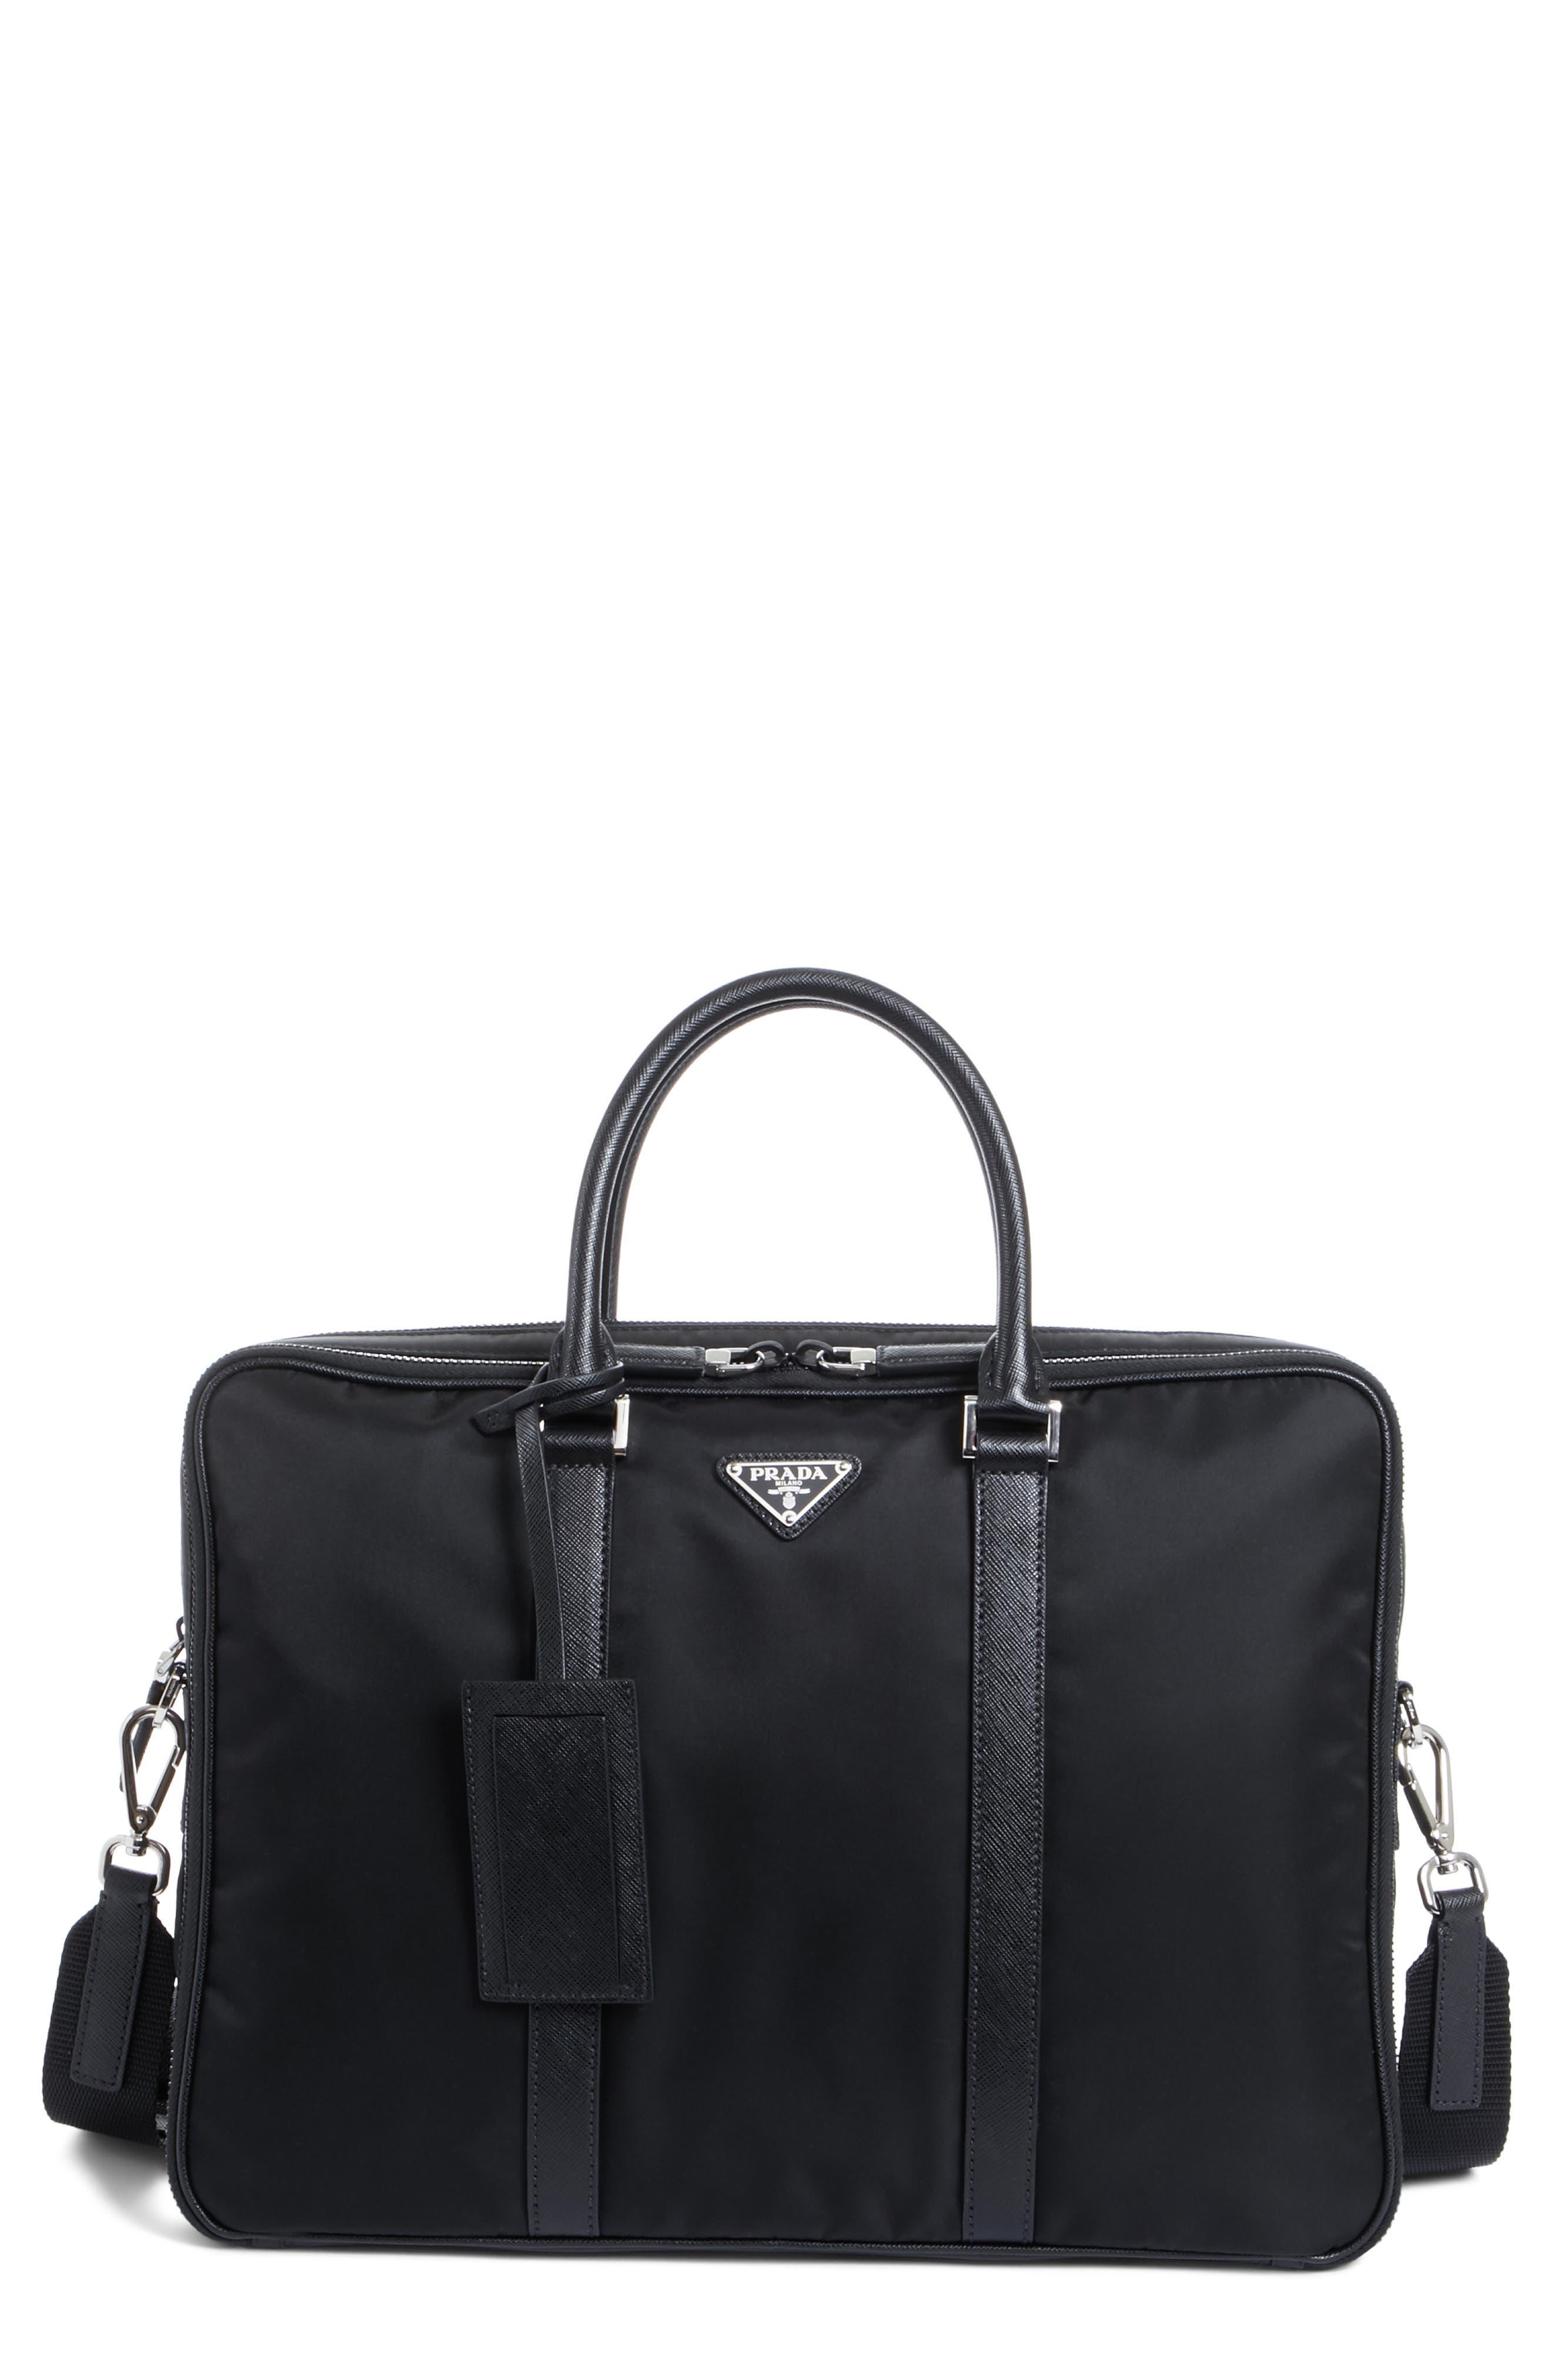 Main Image - Prada Nylon Briefcase with Saffiano Leather Trim